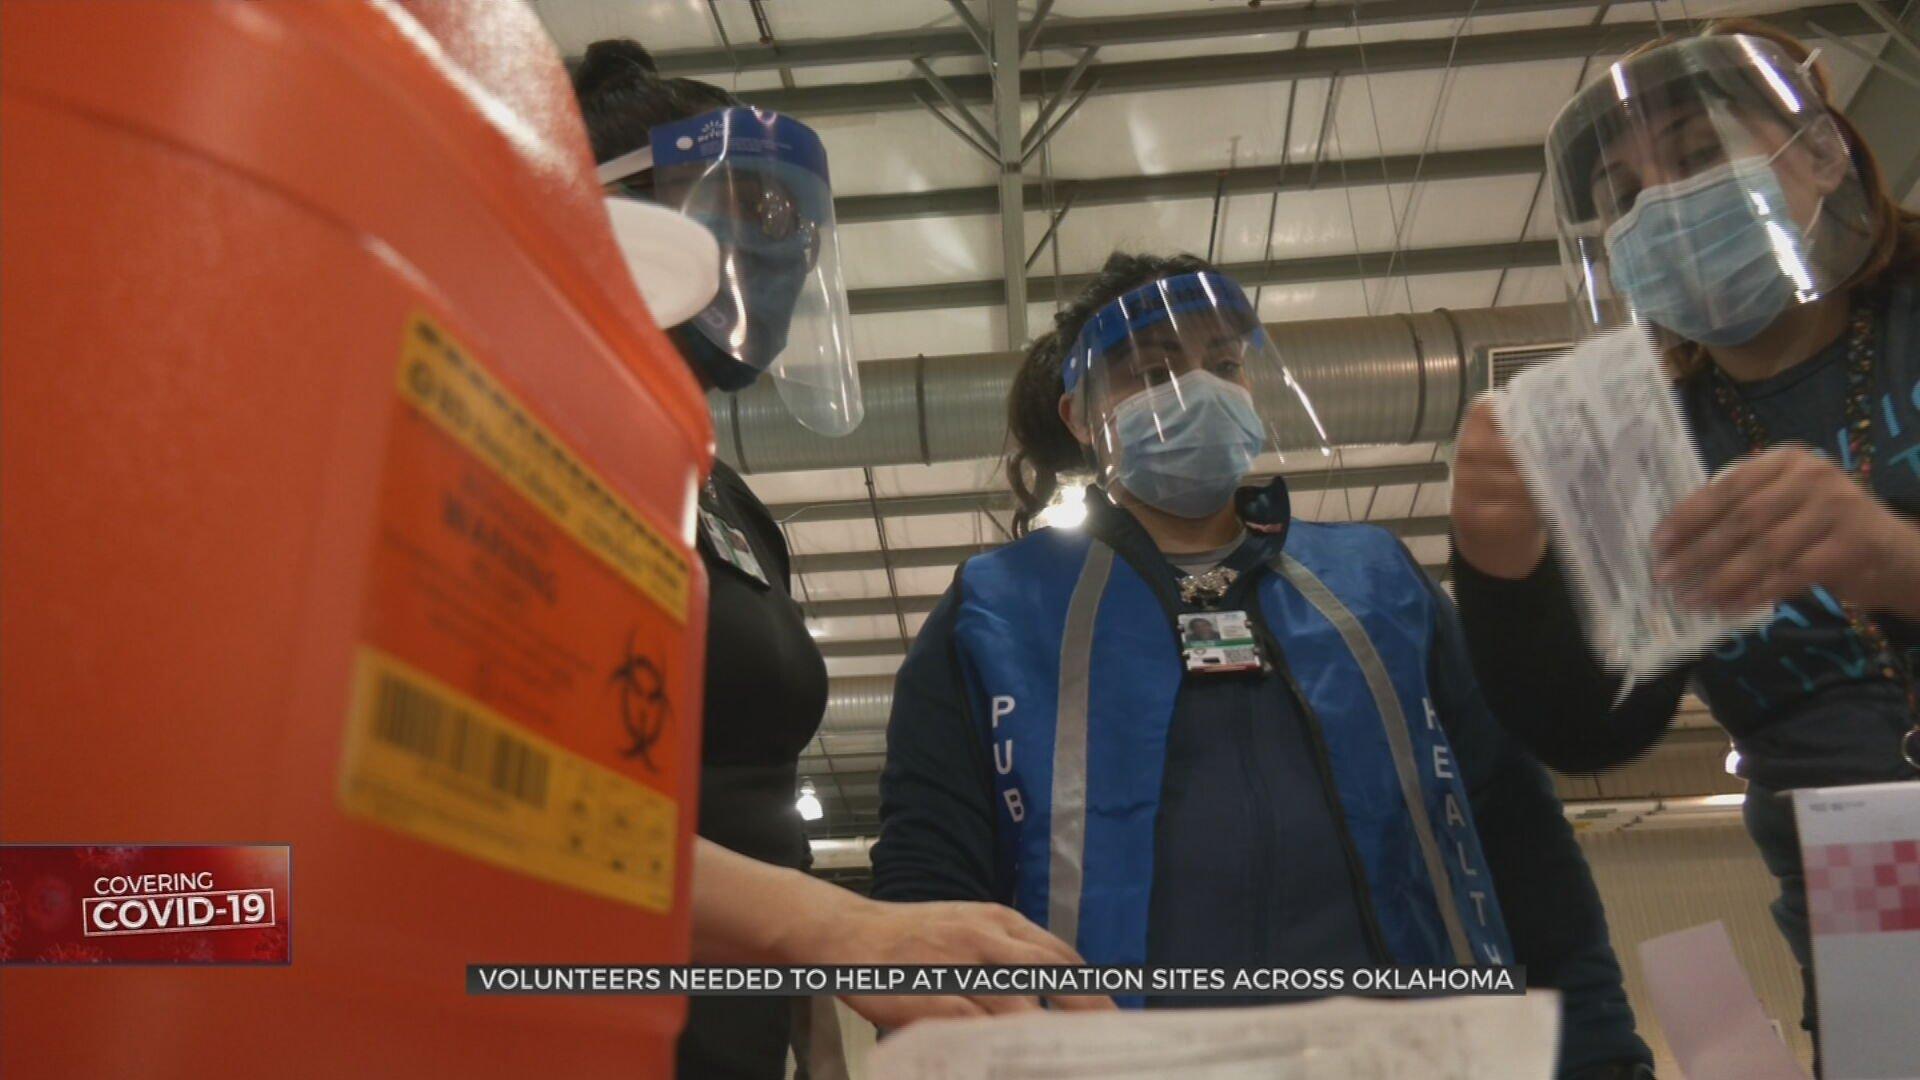 Volunteers Needed To Help COVID-19 Vaccination Sites Across Oklahoma